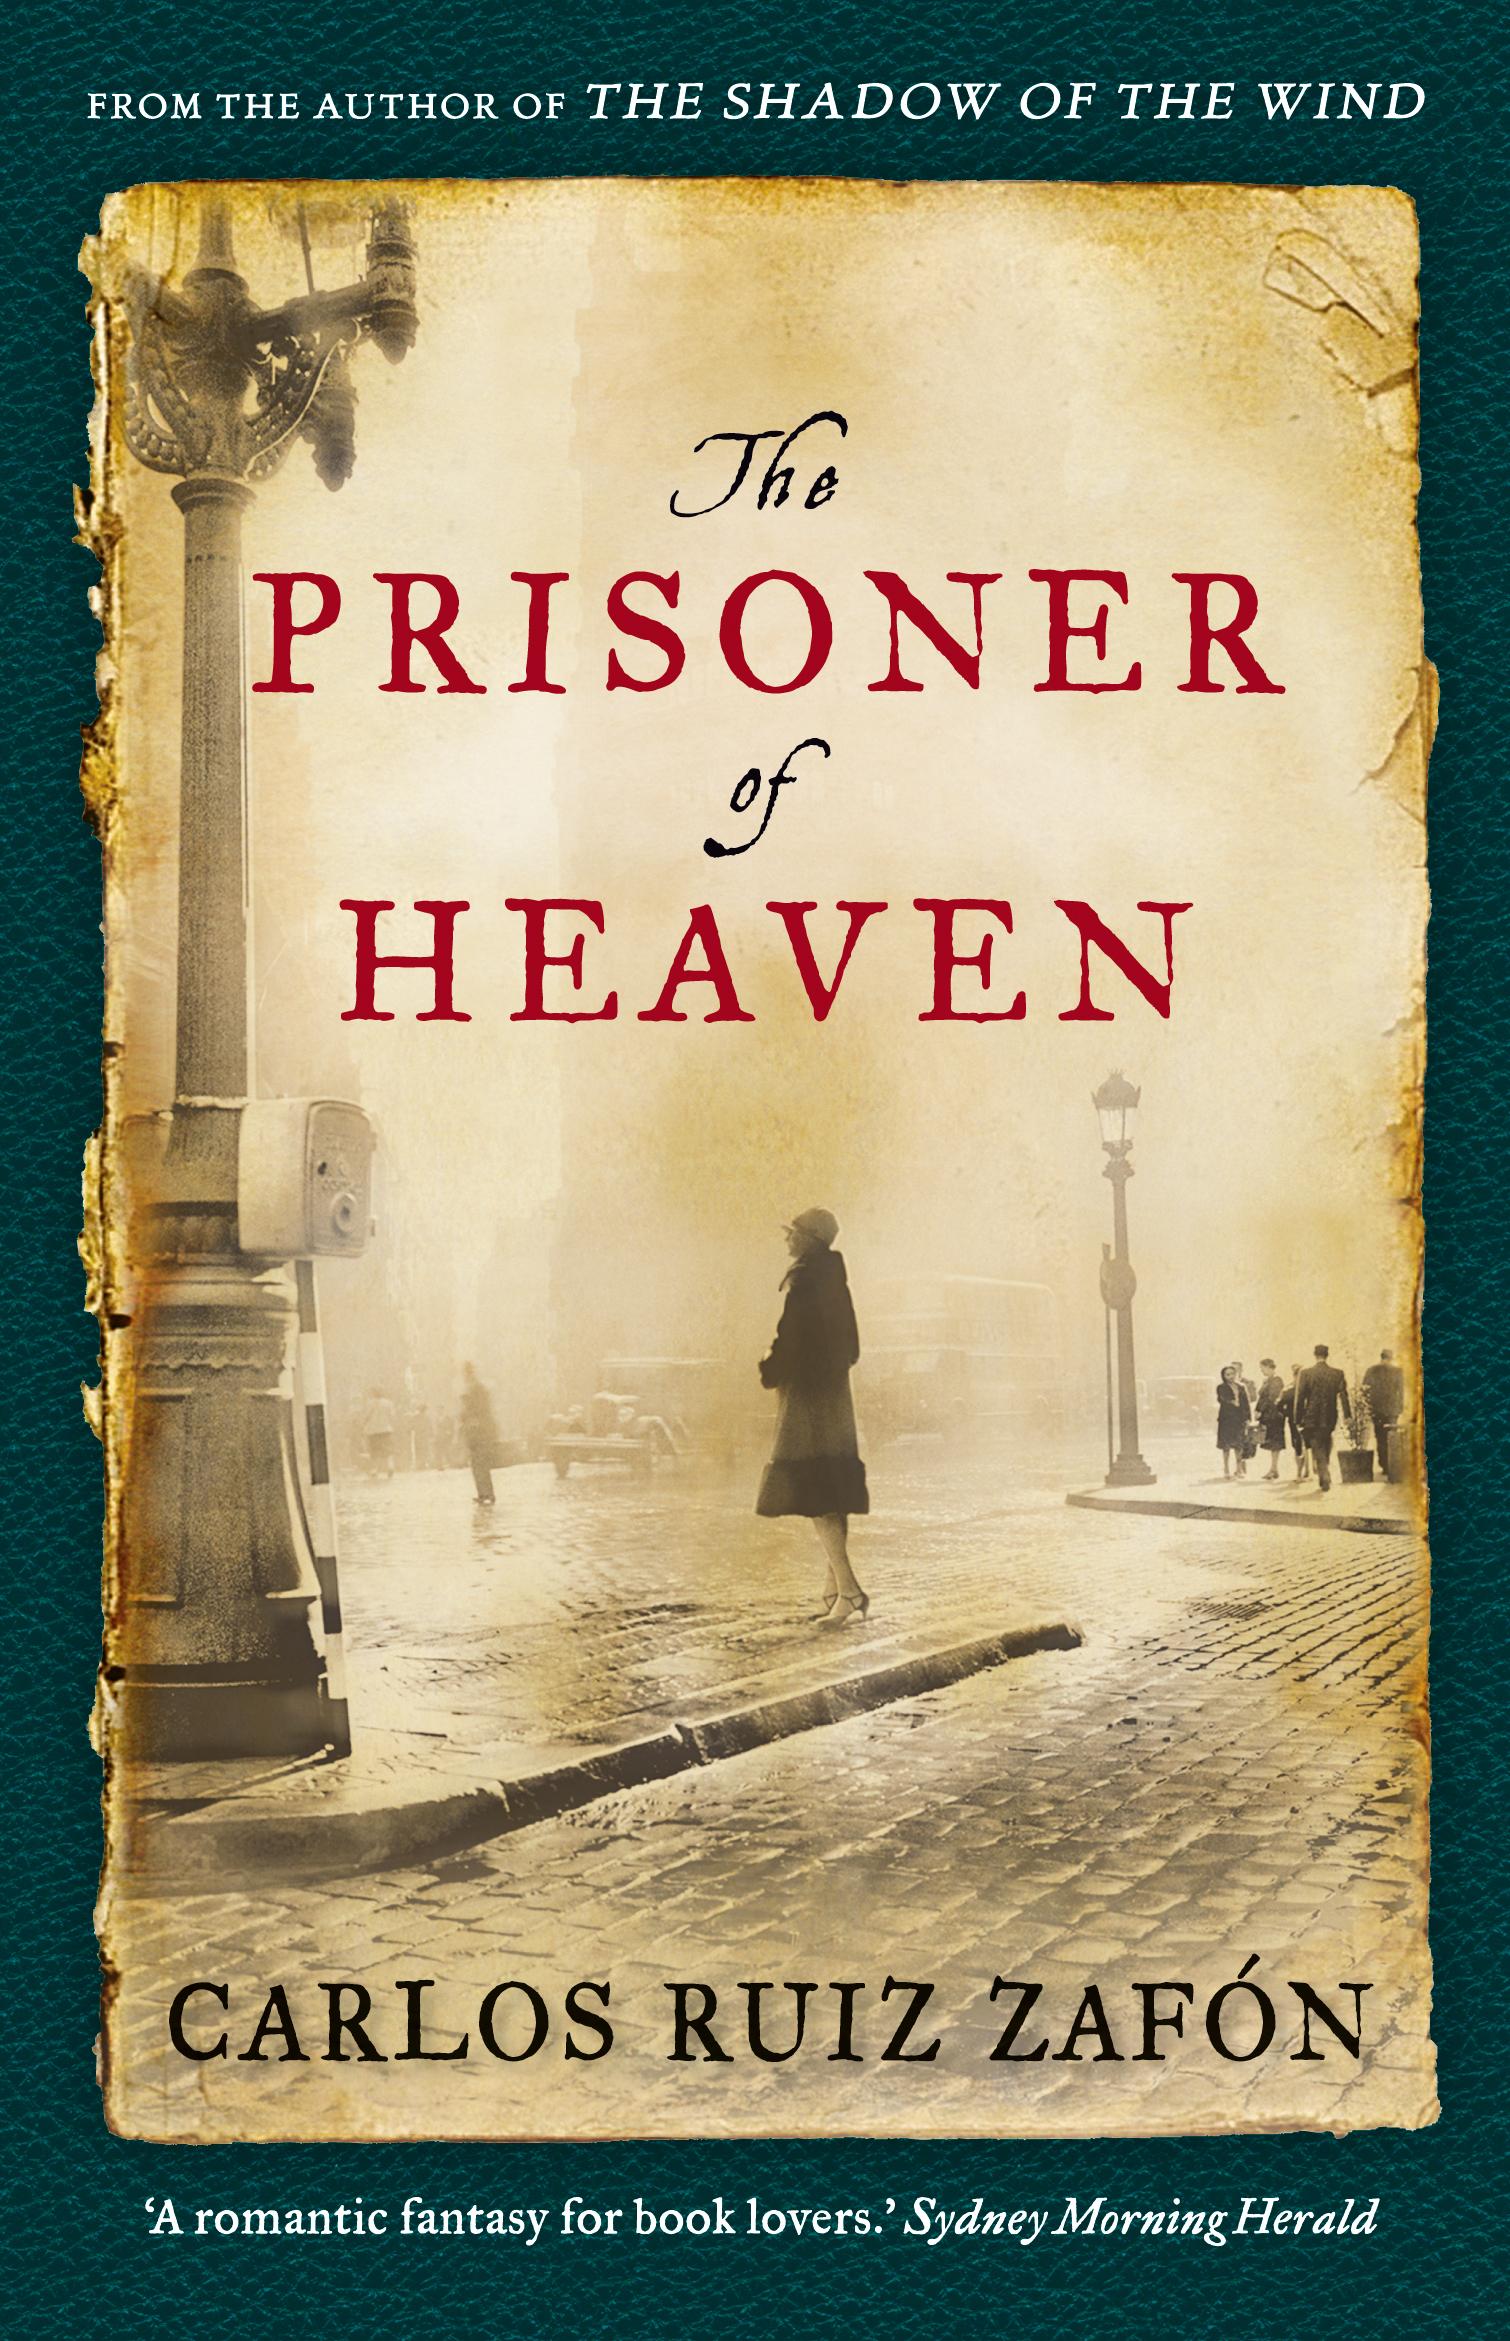 carlos ruiz zafon the prisoner of heaven pdf